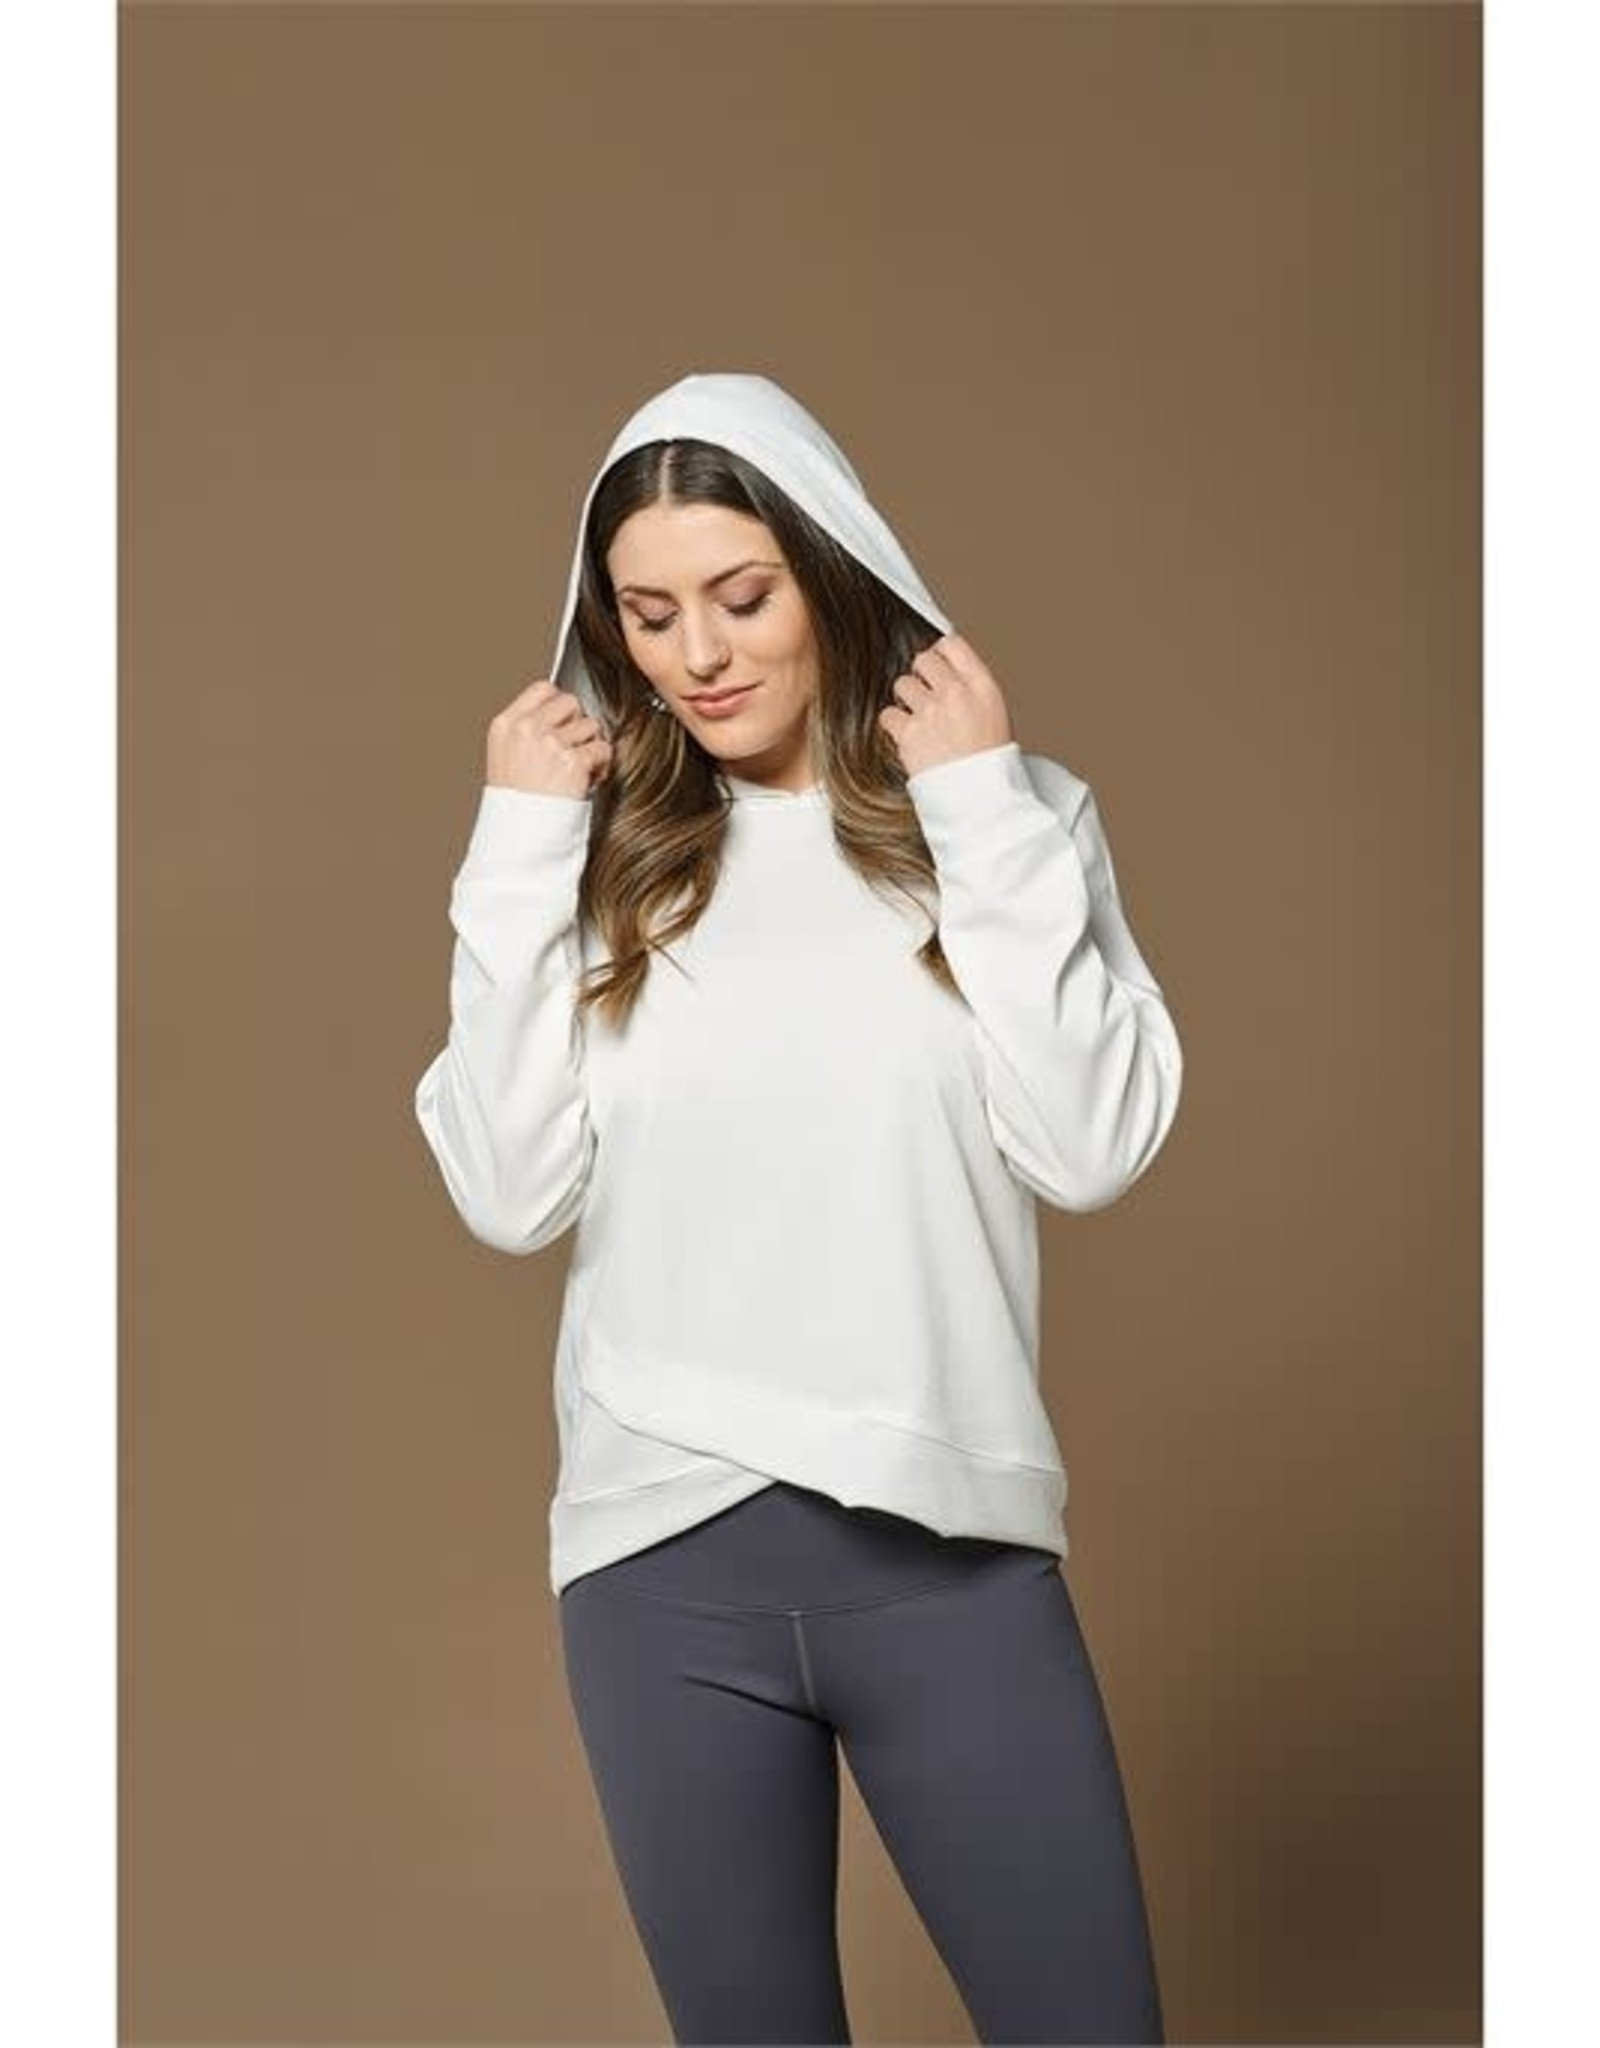 Coco & Carmen Athena Hooded Sweatshirt